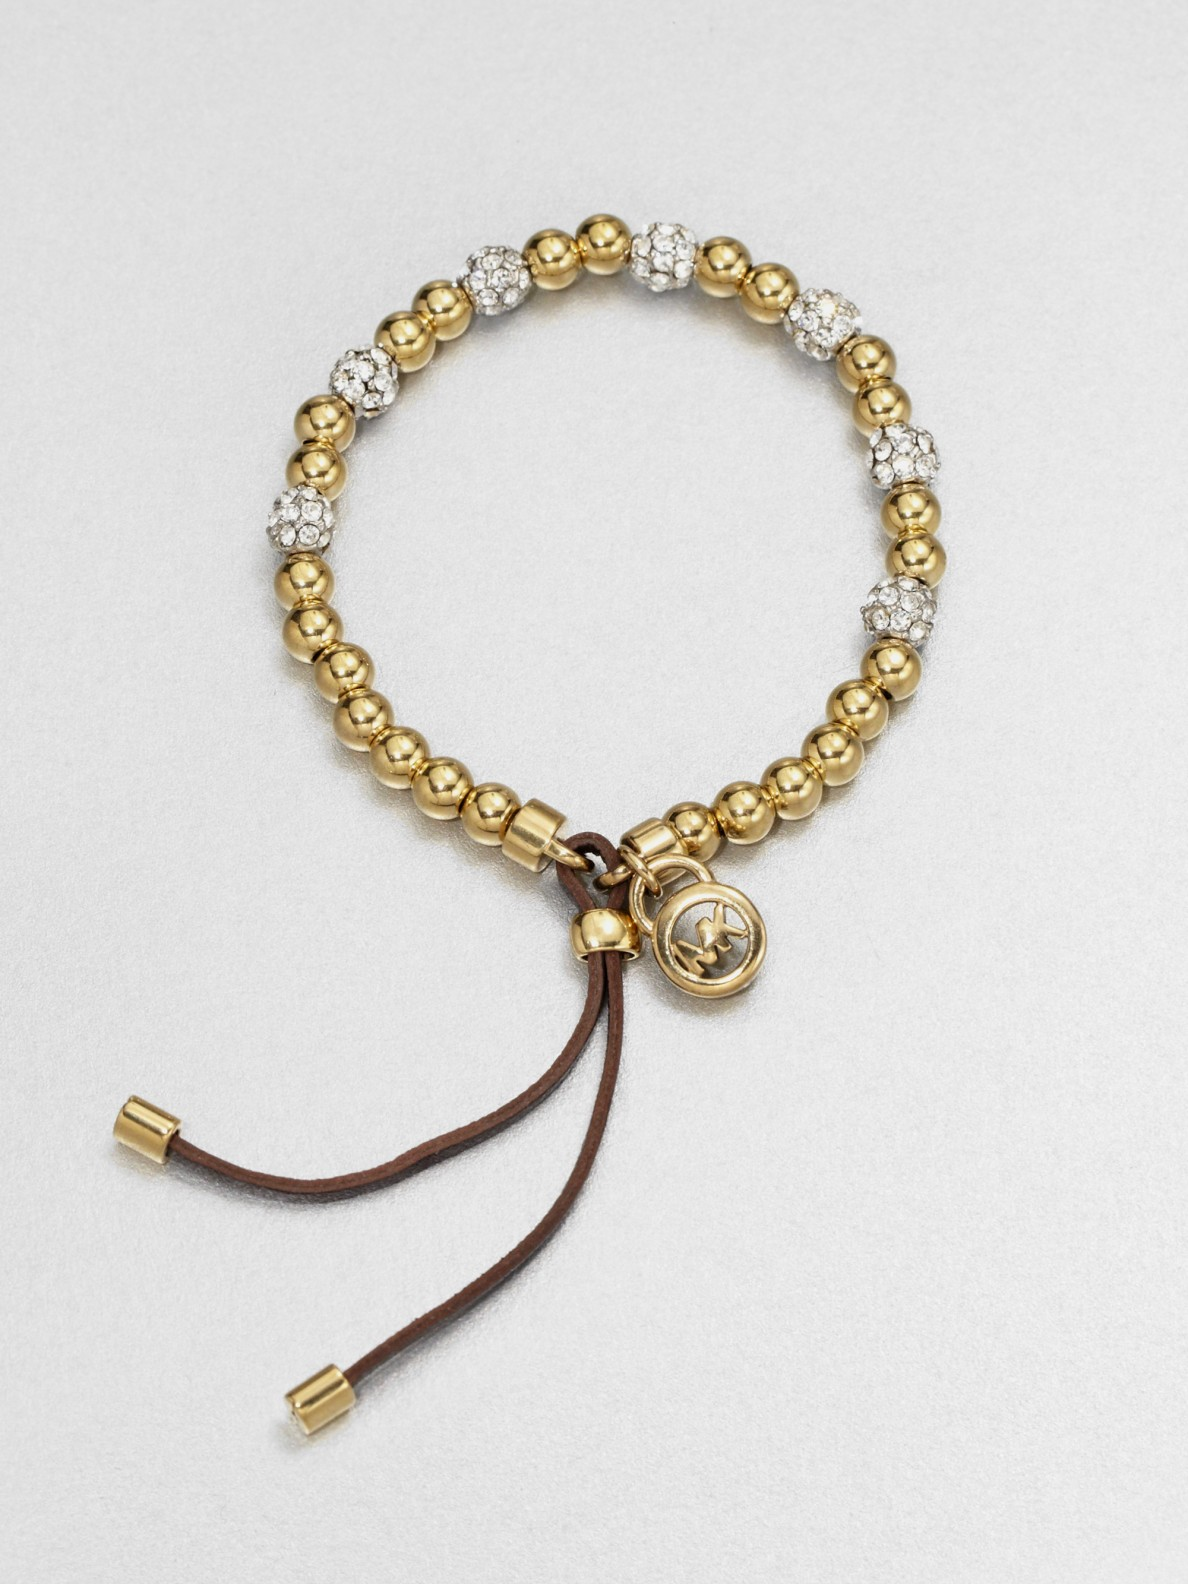 1a5fa6083699 Lyst - Michael Kors Beaded Stretch Bracelet in Metallic